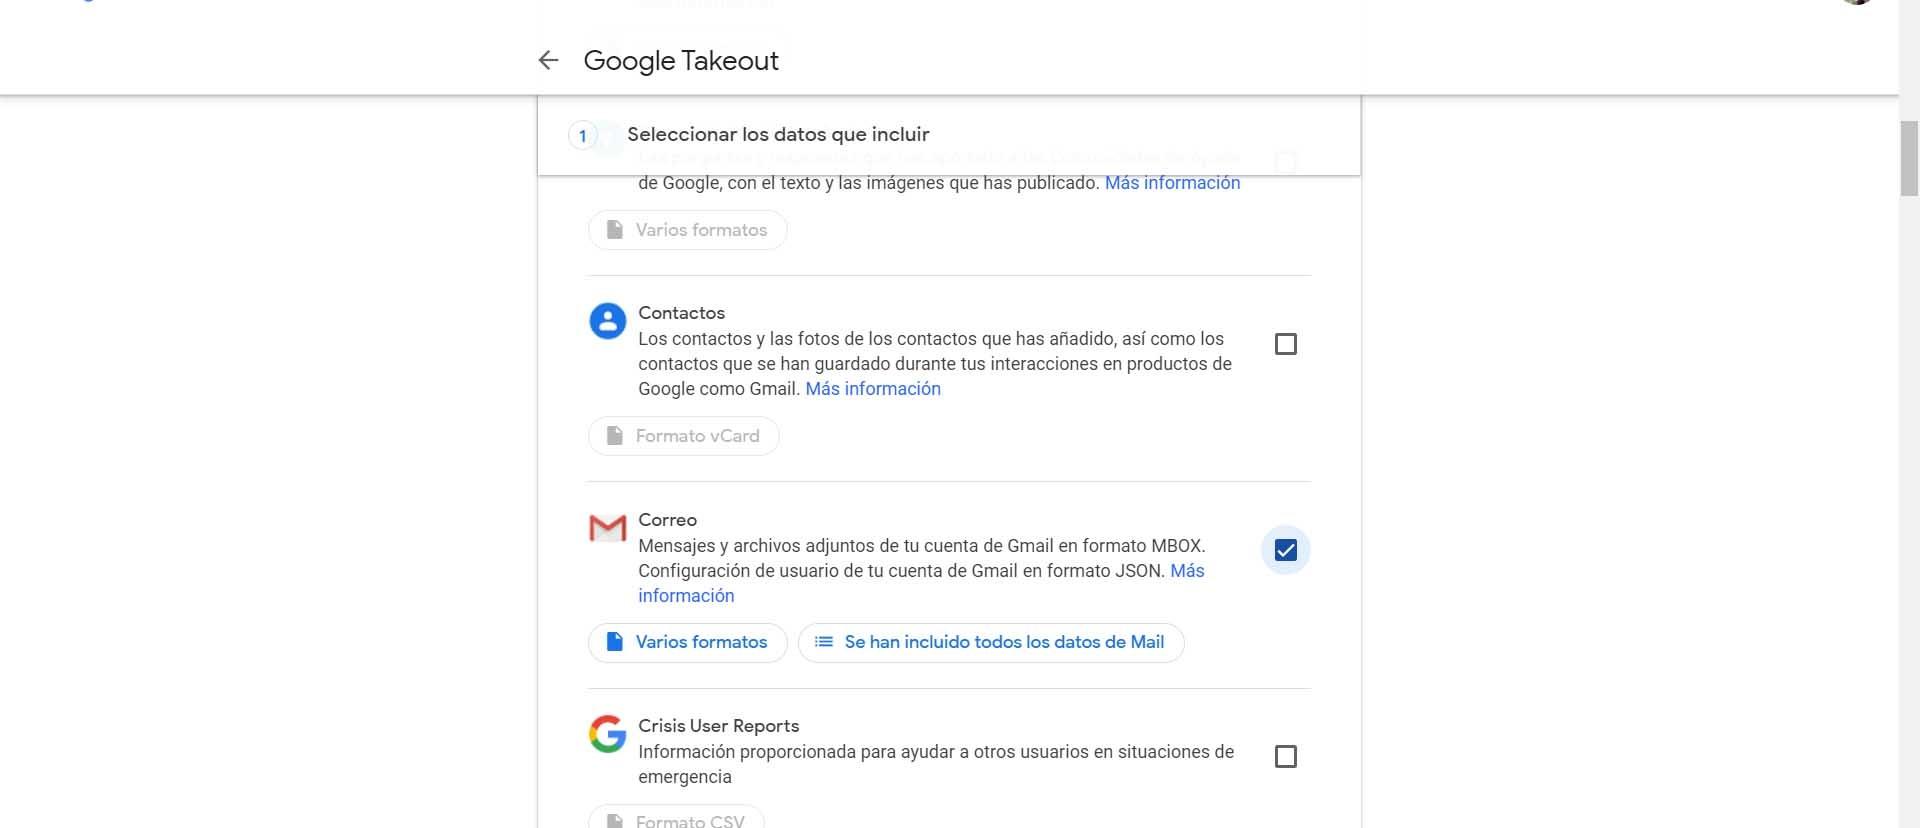 Descargar correos de Gmail